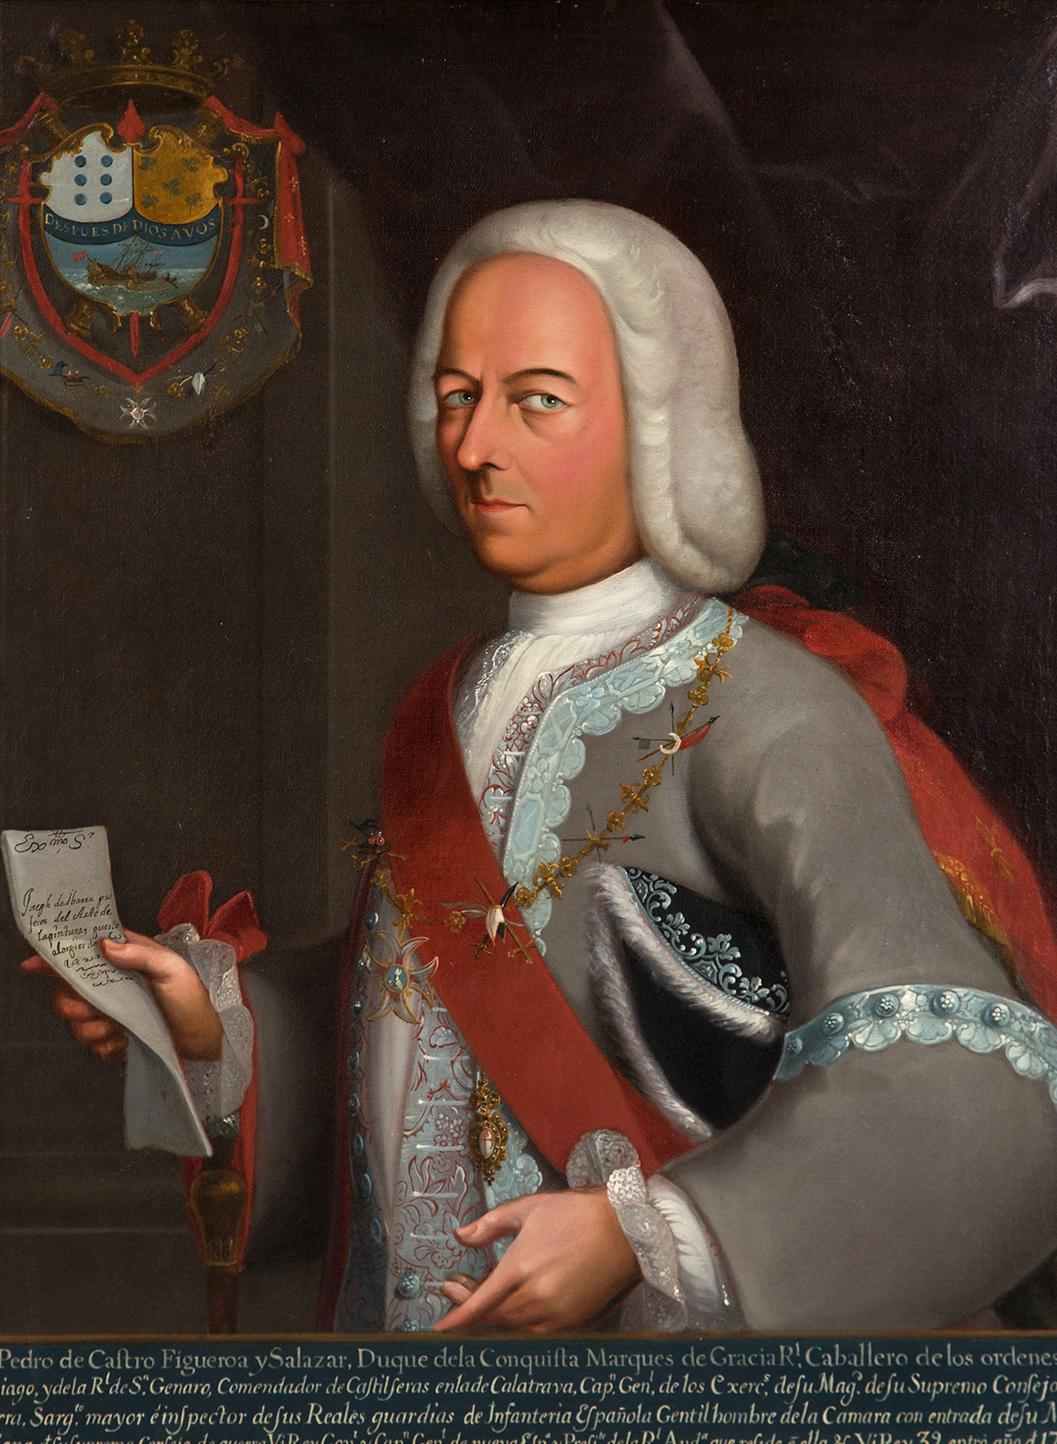 Pedro de castro y figueroa wikip dia - Pedro piqueras biografia ...